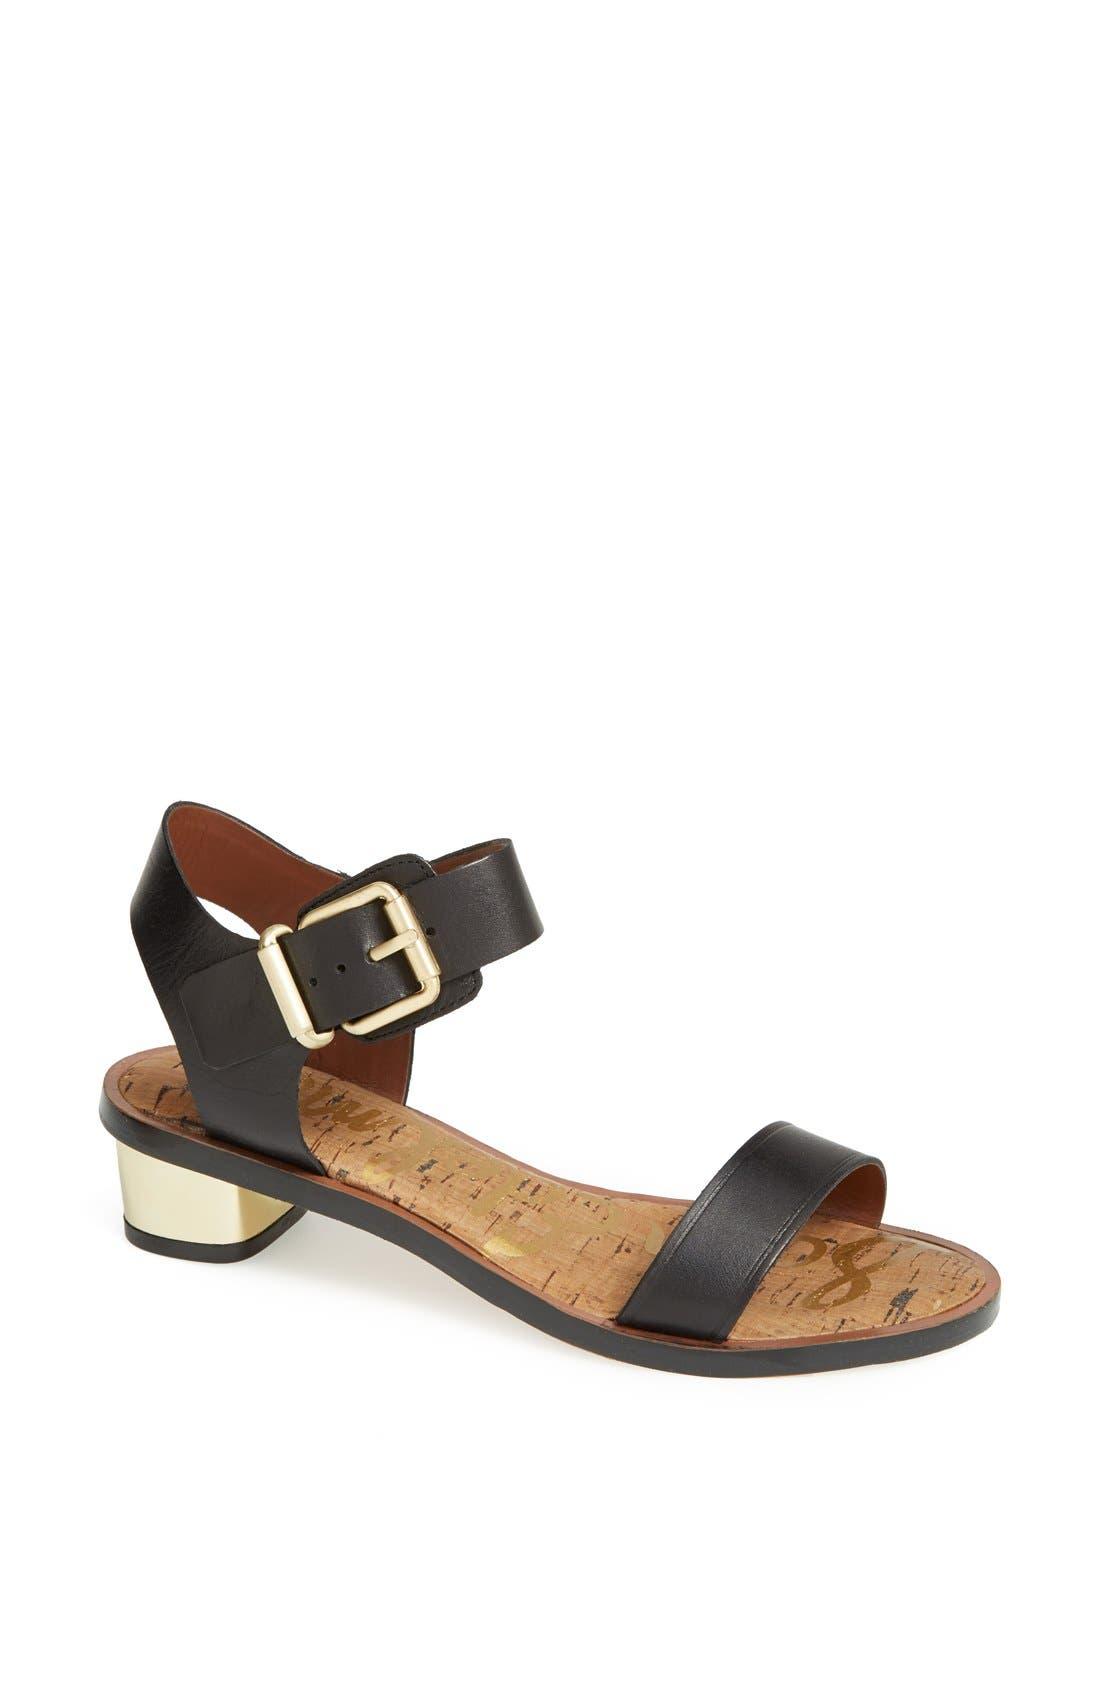 Alternate Image 1 Selected - Sam Edelman 'Trina' Sandal